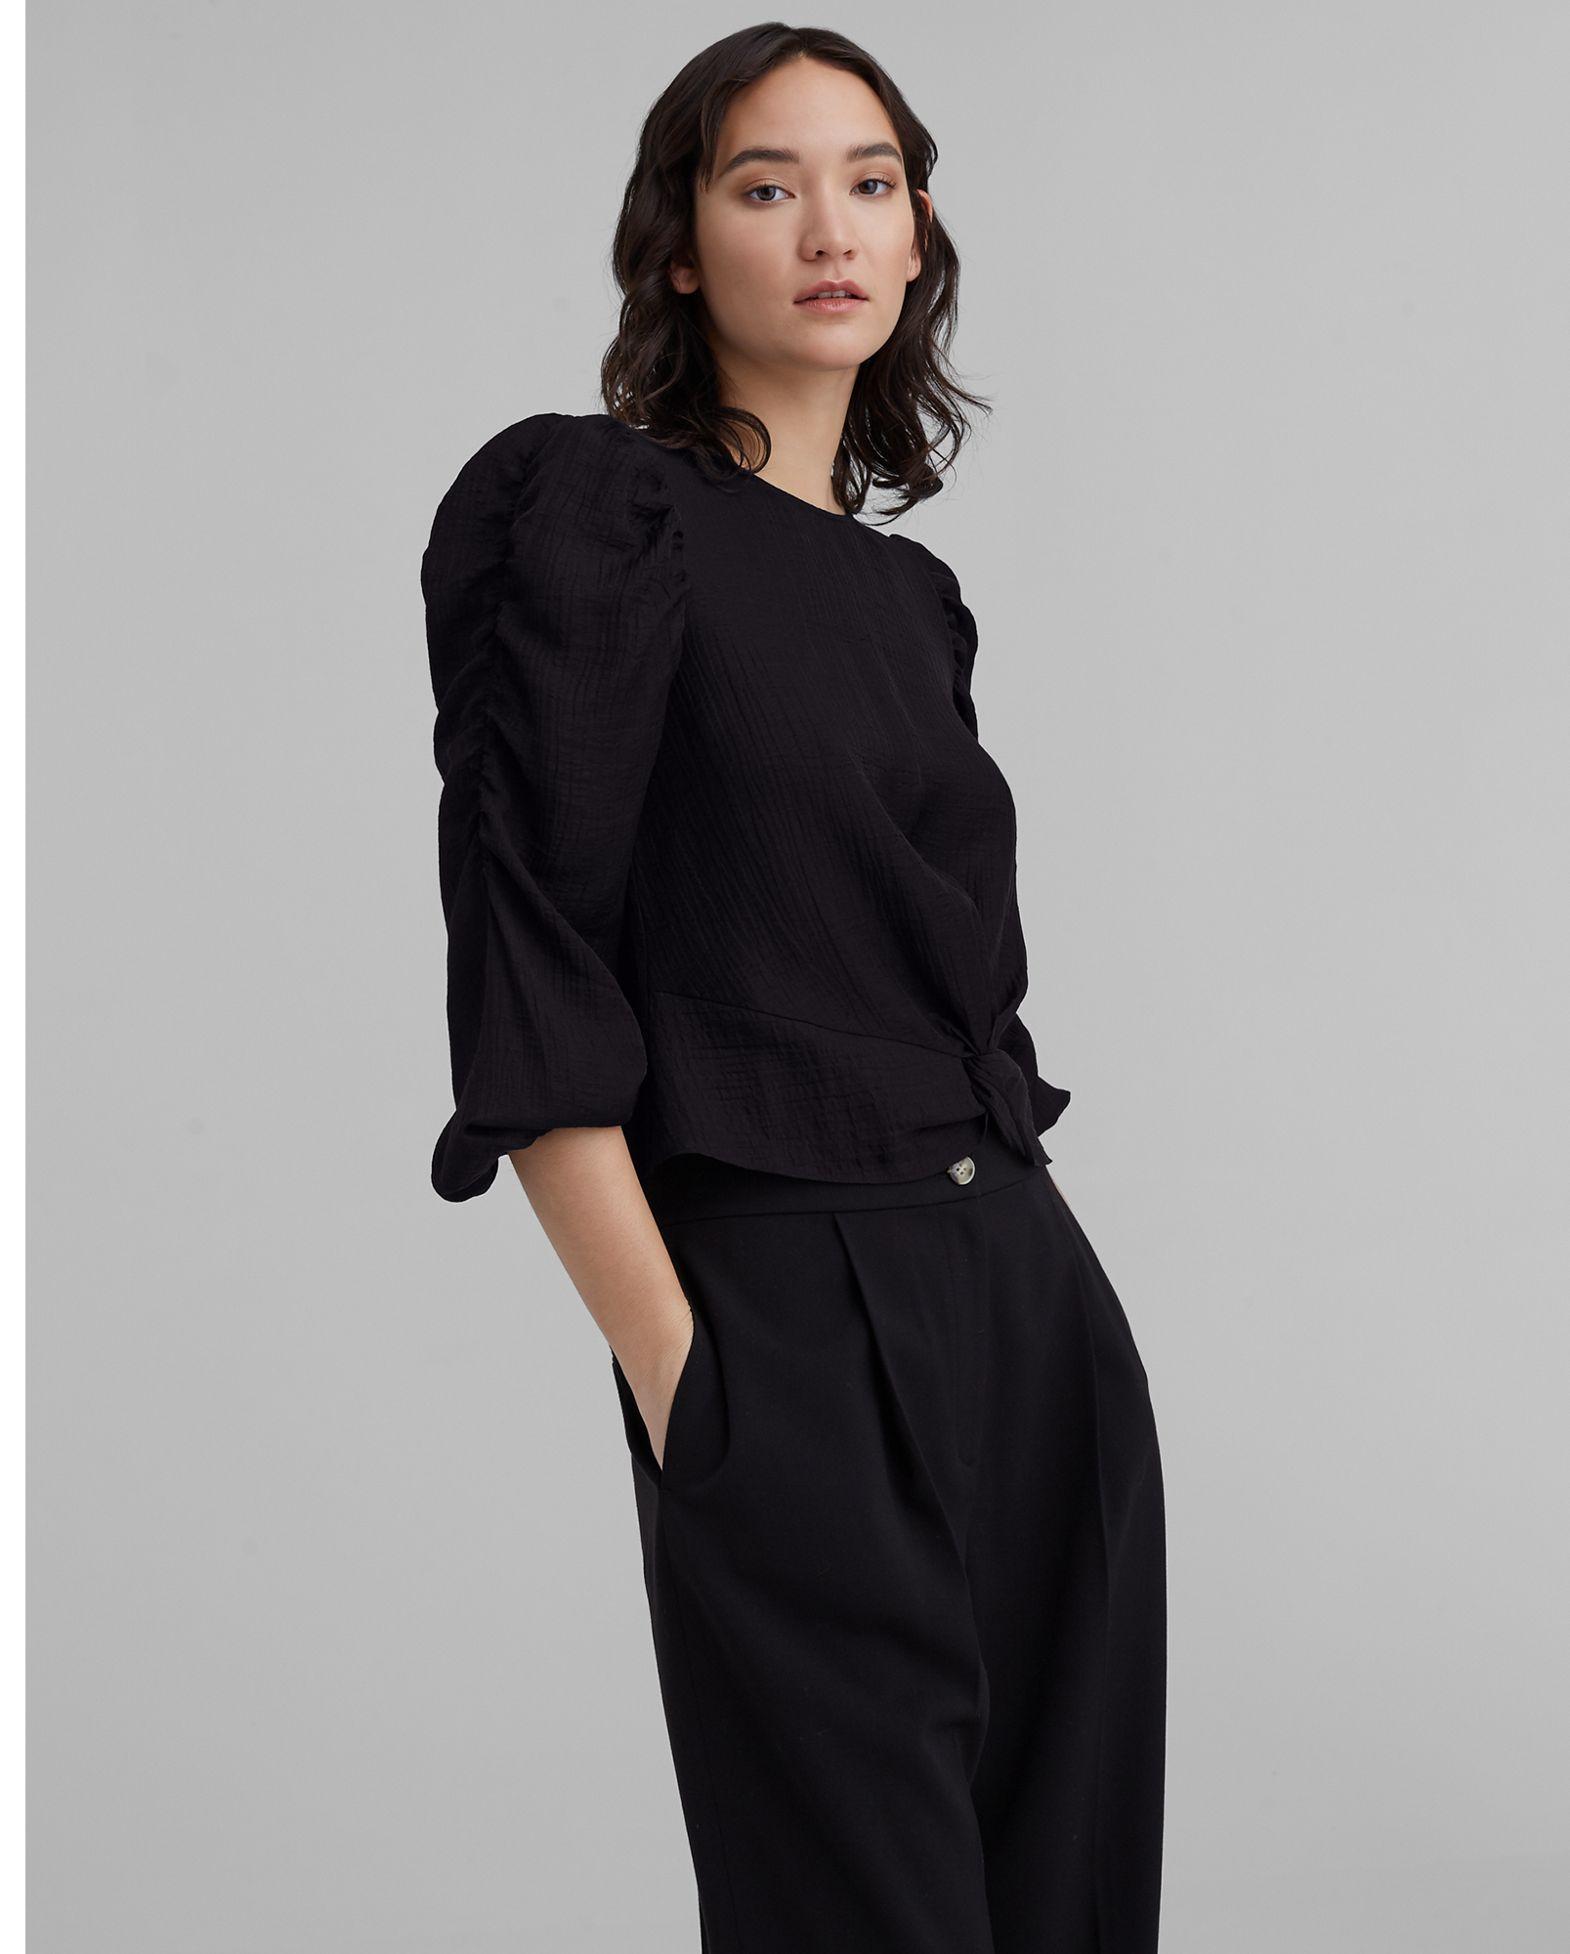 CLUB MONACO Shirred Puff Sleeve Top